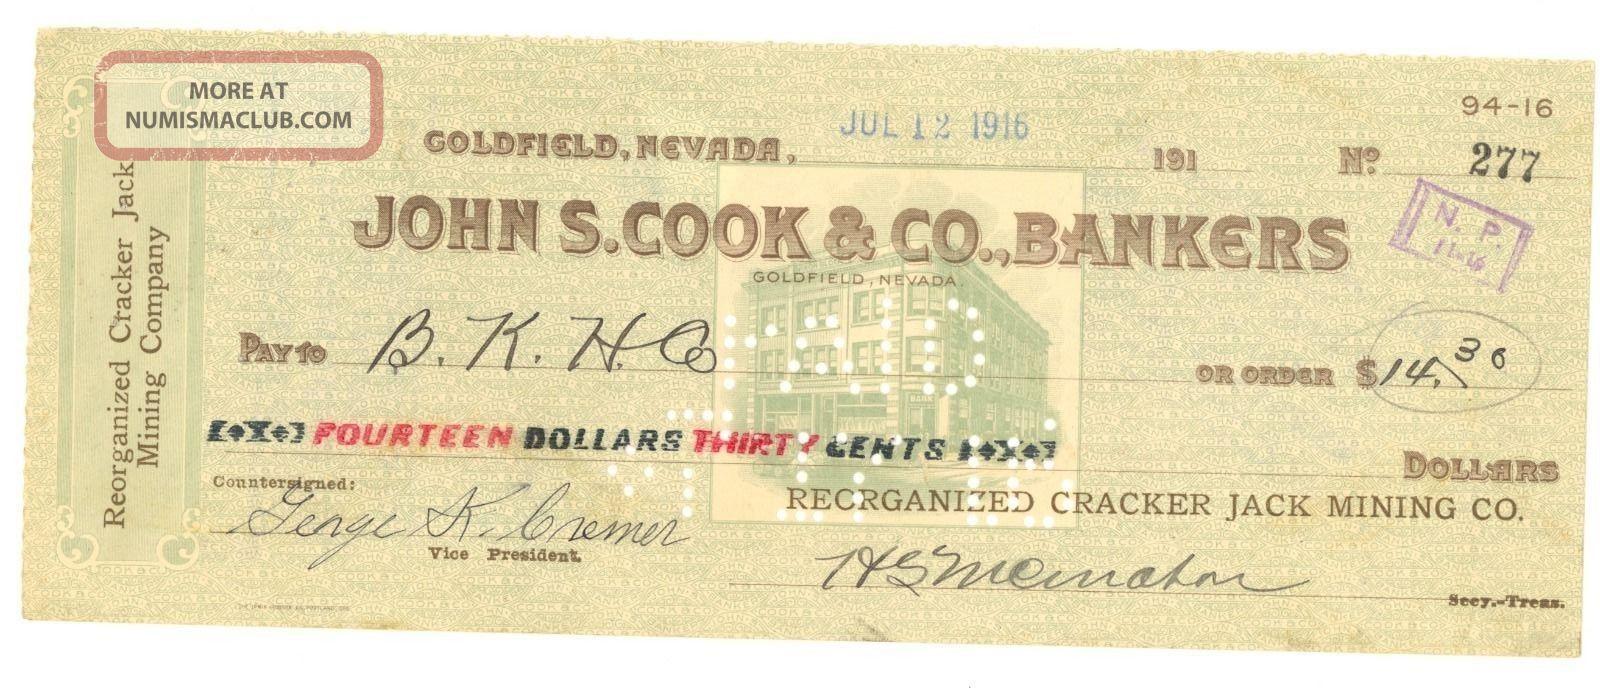 1916 Reorganized Cracker Jack Mining Co.  - Check 277 - Goldfield,  Nevada Stocks & Bonds, Scripophily photo